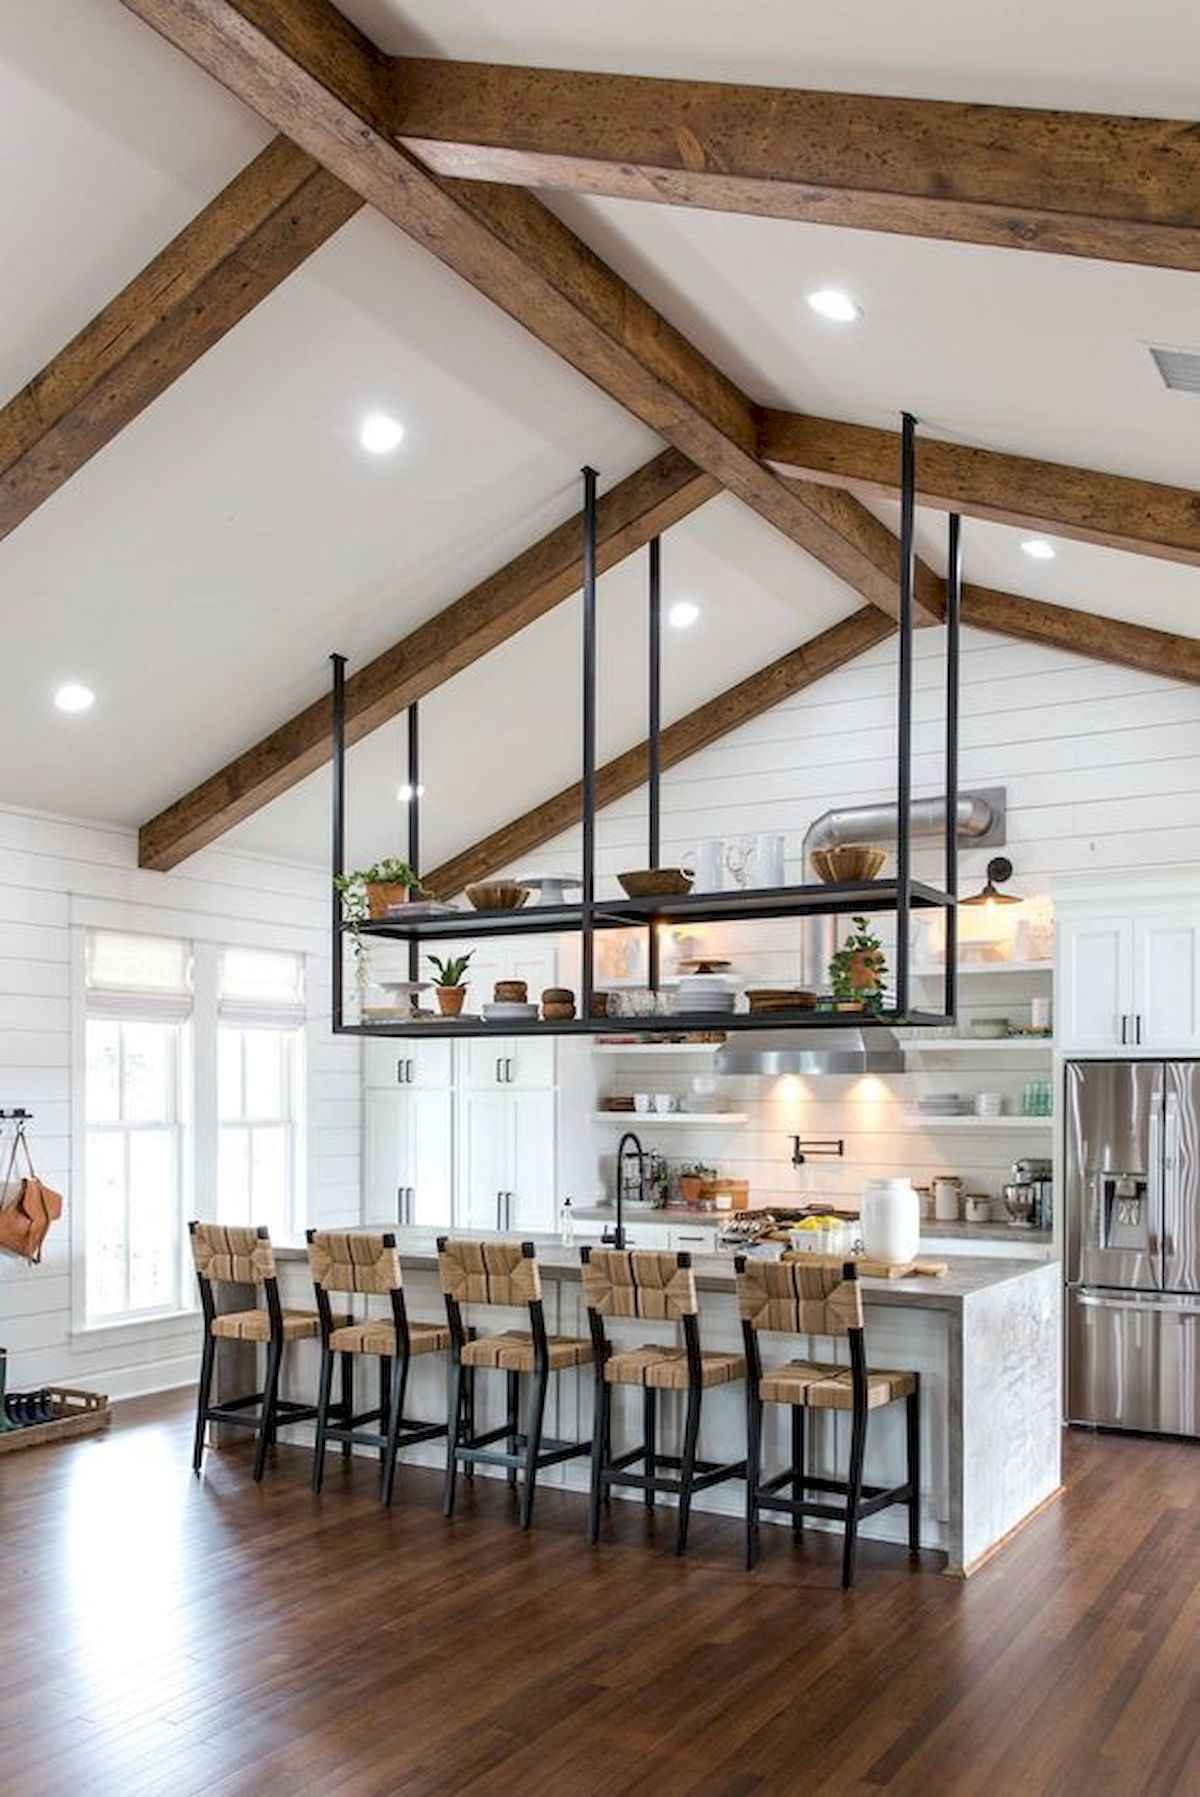 25 Best Fixer Upper Farmhouse kitchen Design Ideas (17)